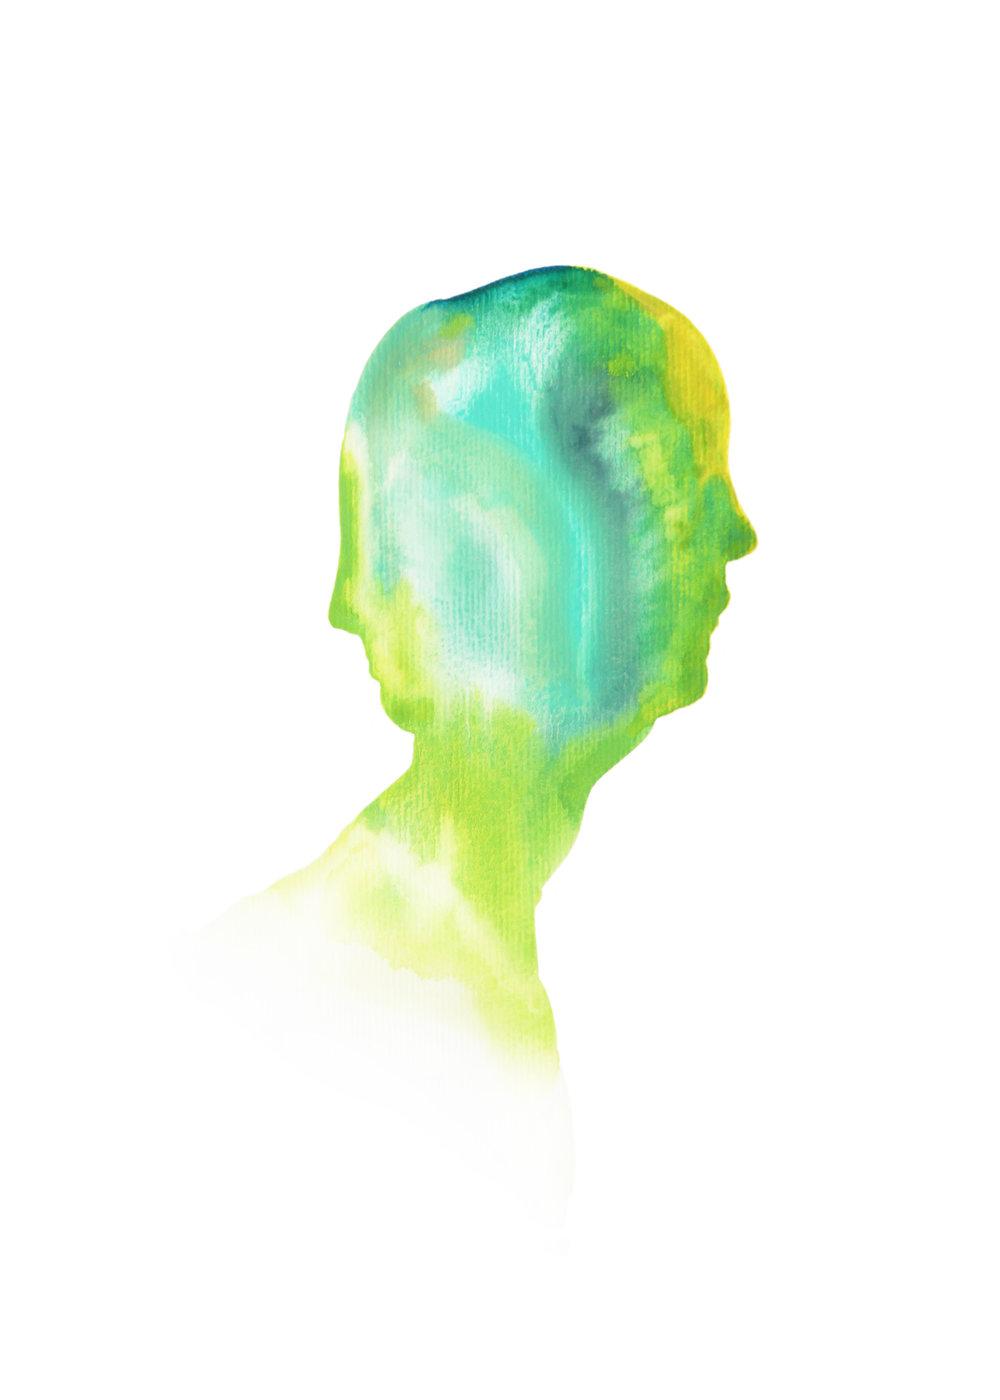 Garçon àdeux têtes (green)  ,2015,watercolor on paper,30x40cm